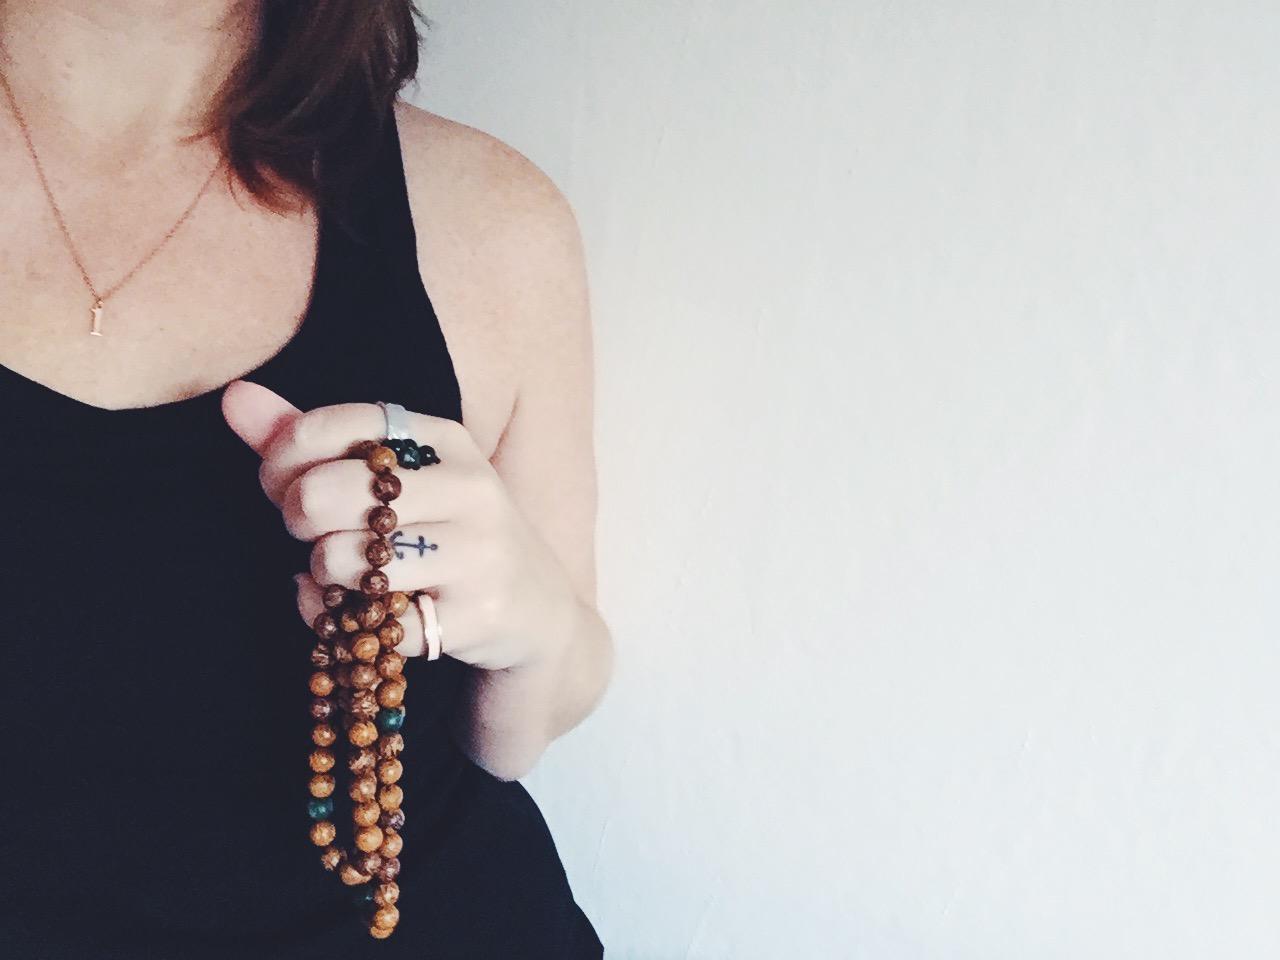 meditation me mala beads